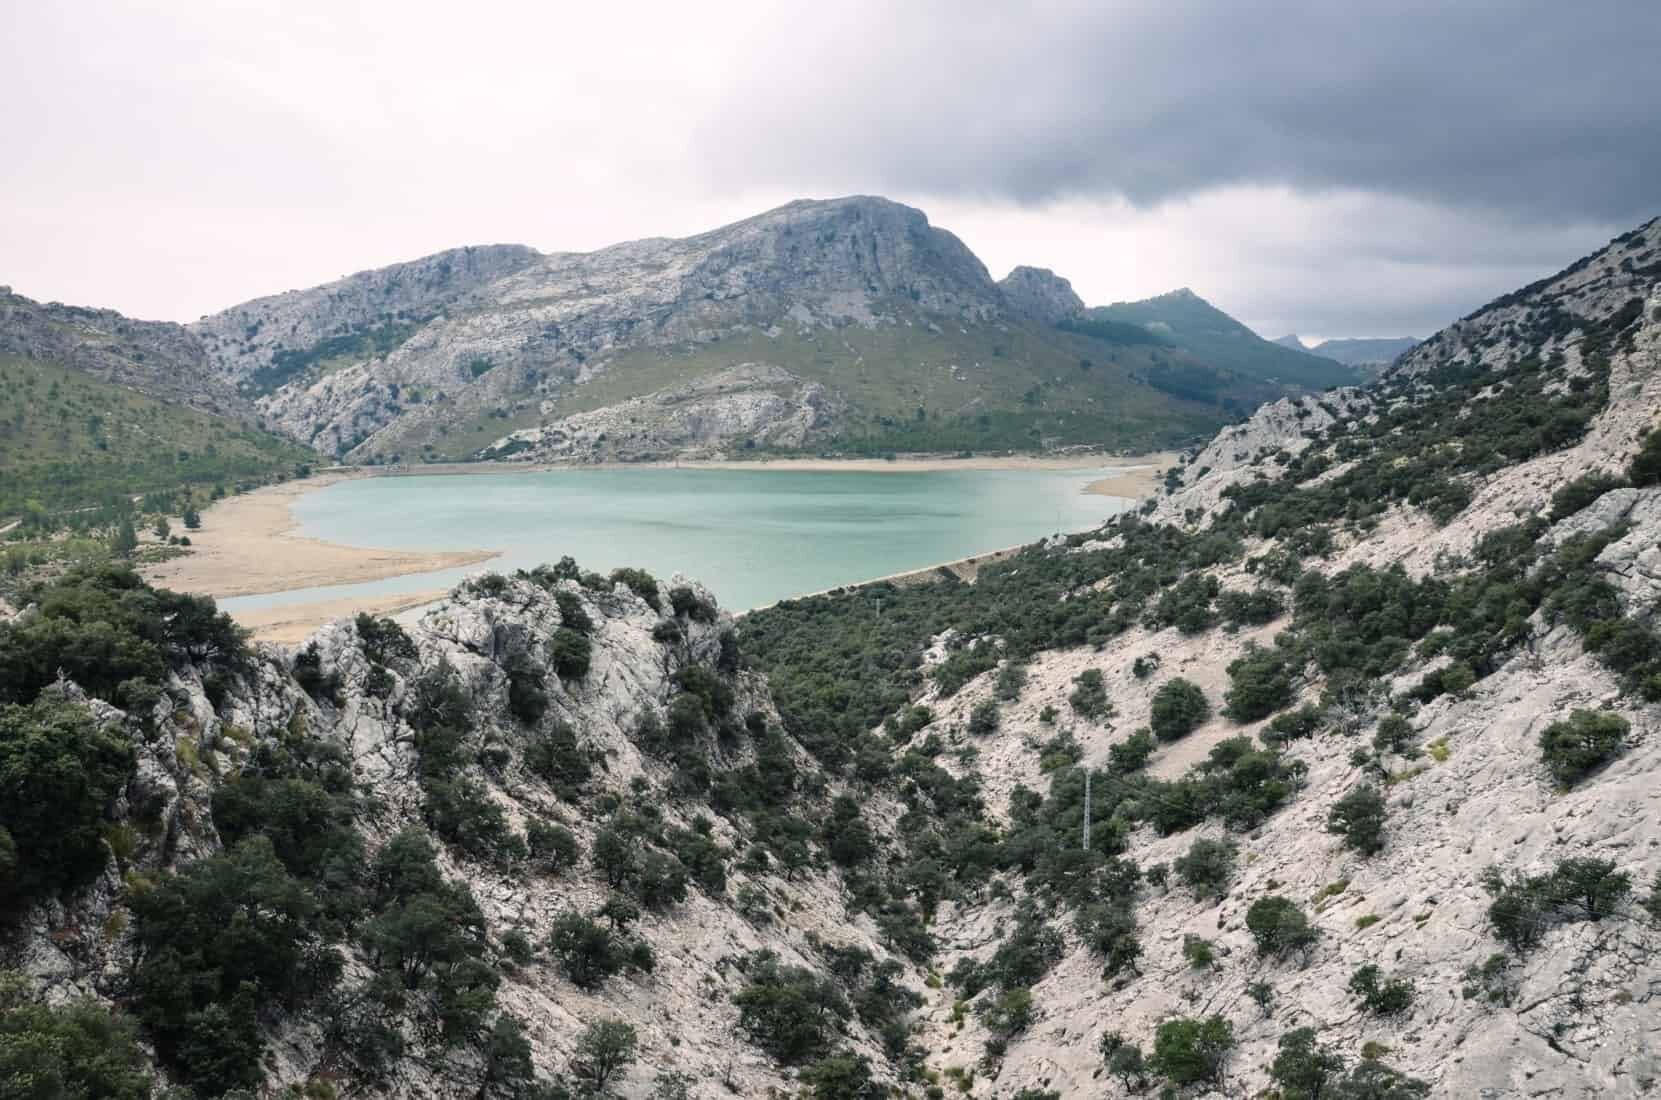 Cuber søen i Serra de Tramuntana